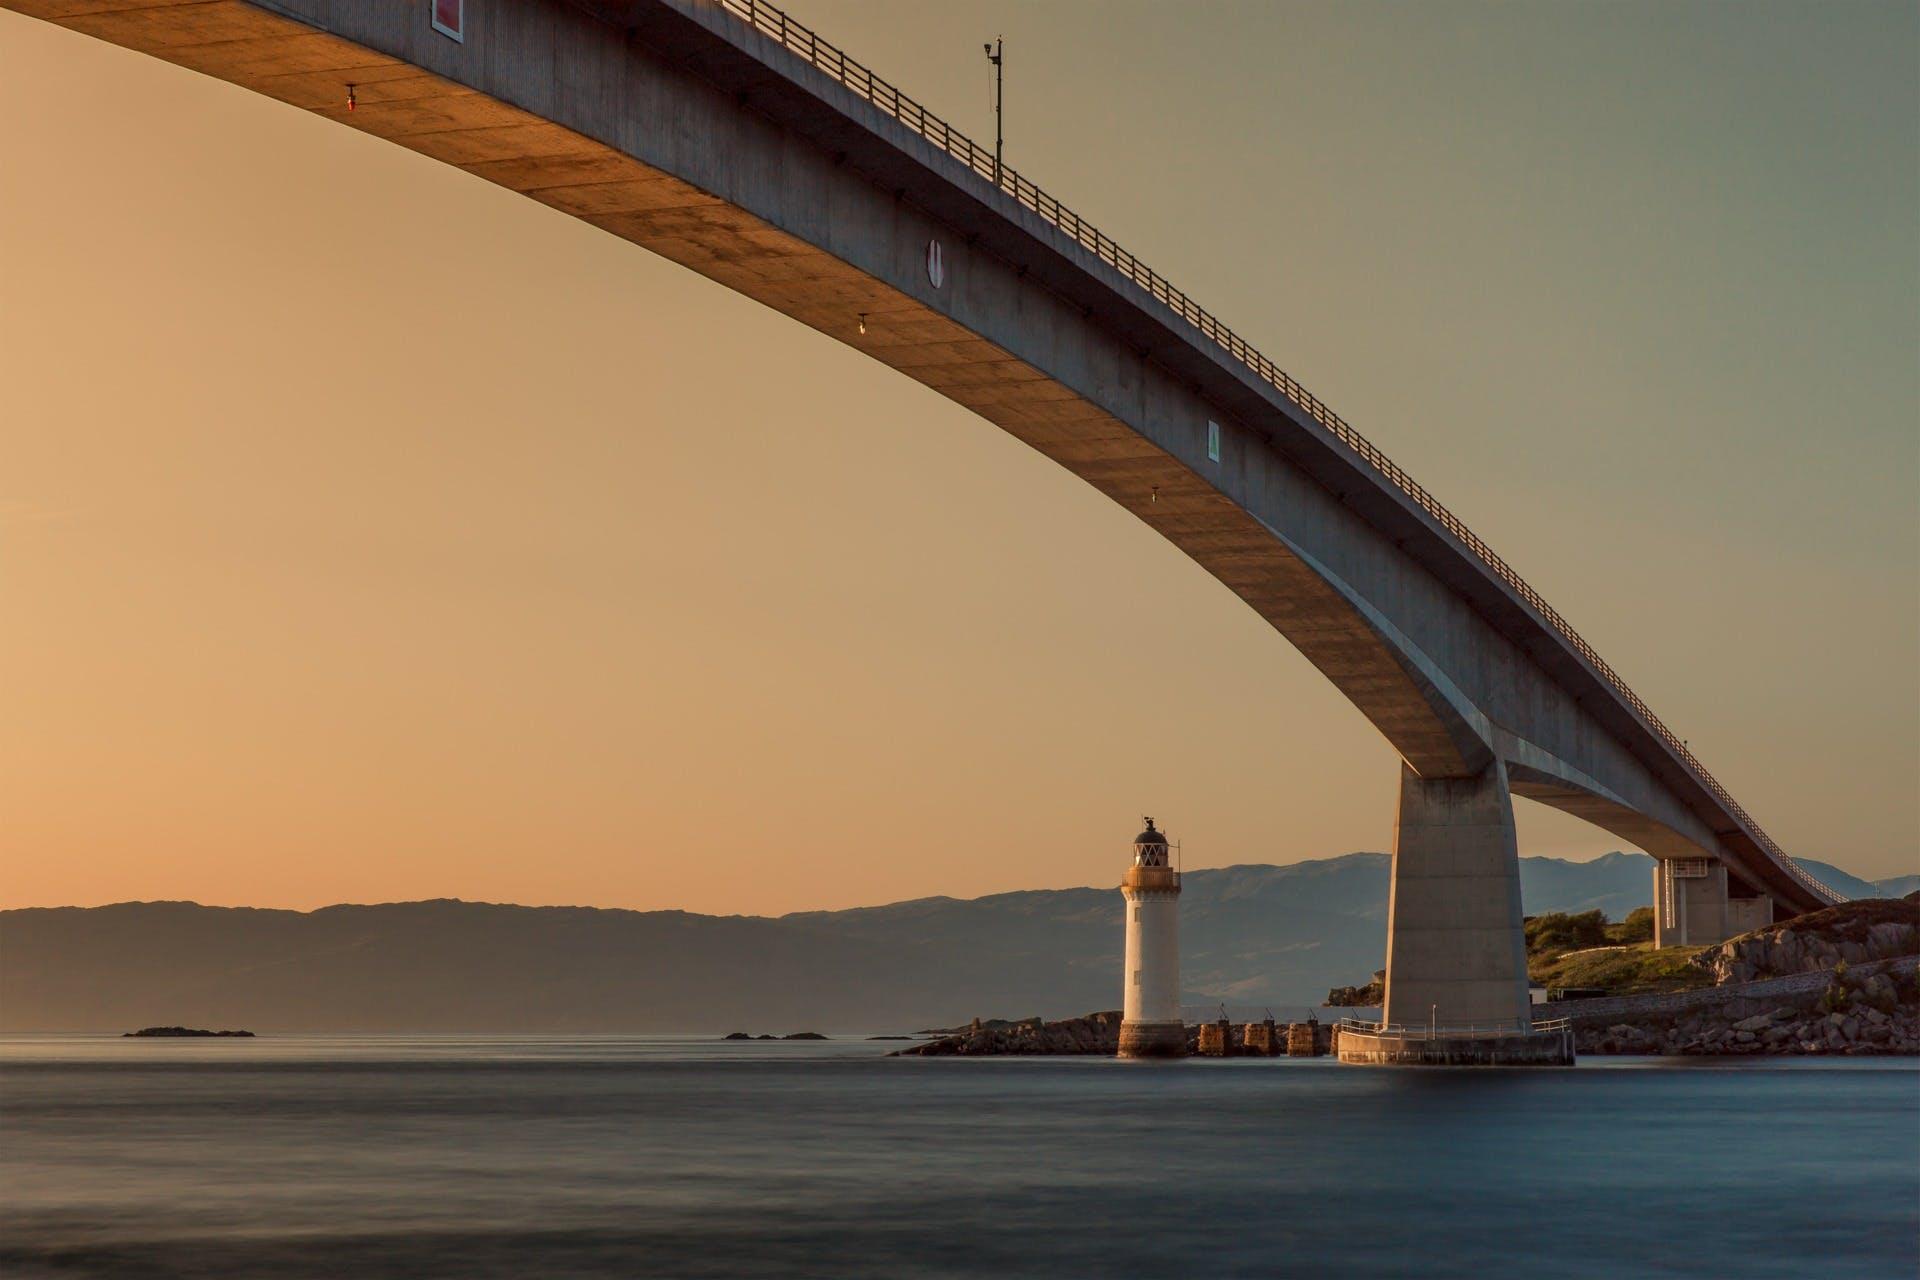 Concrete Long Bridge